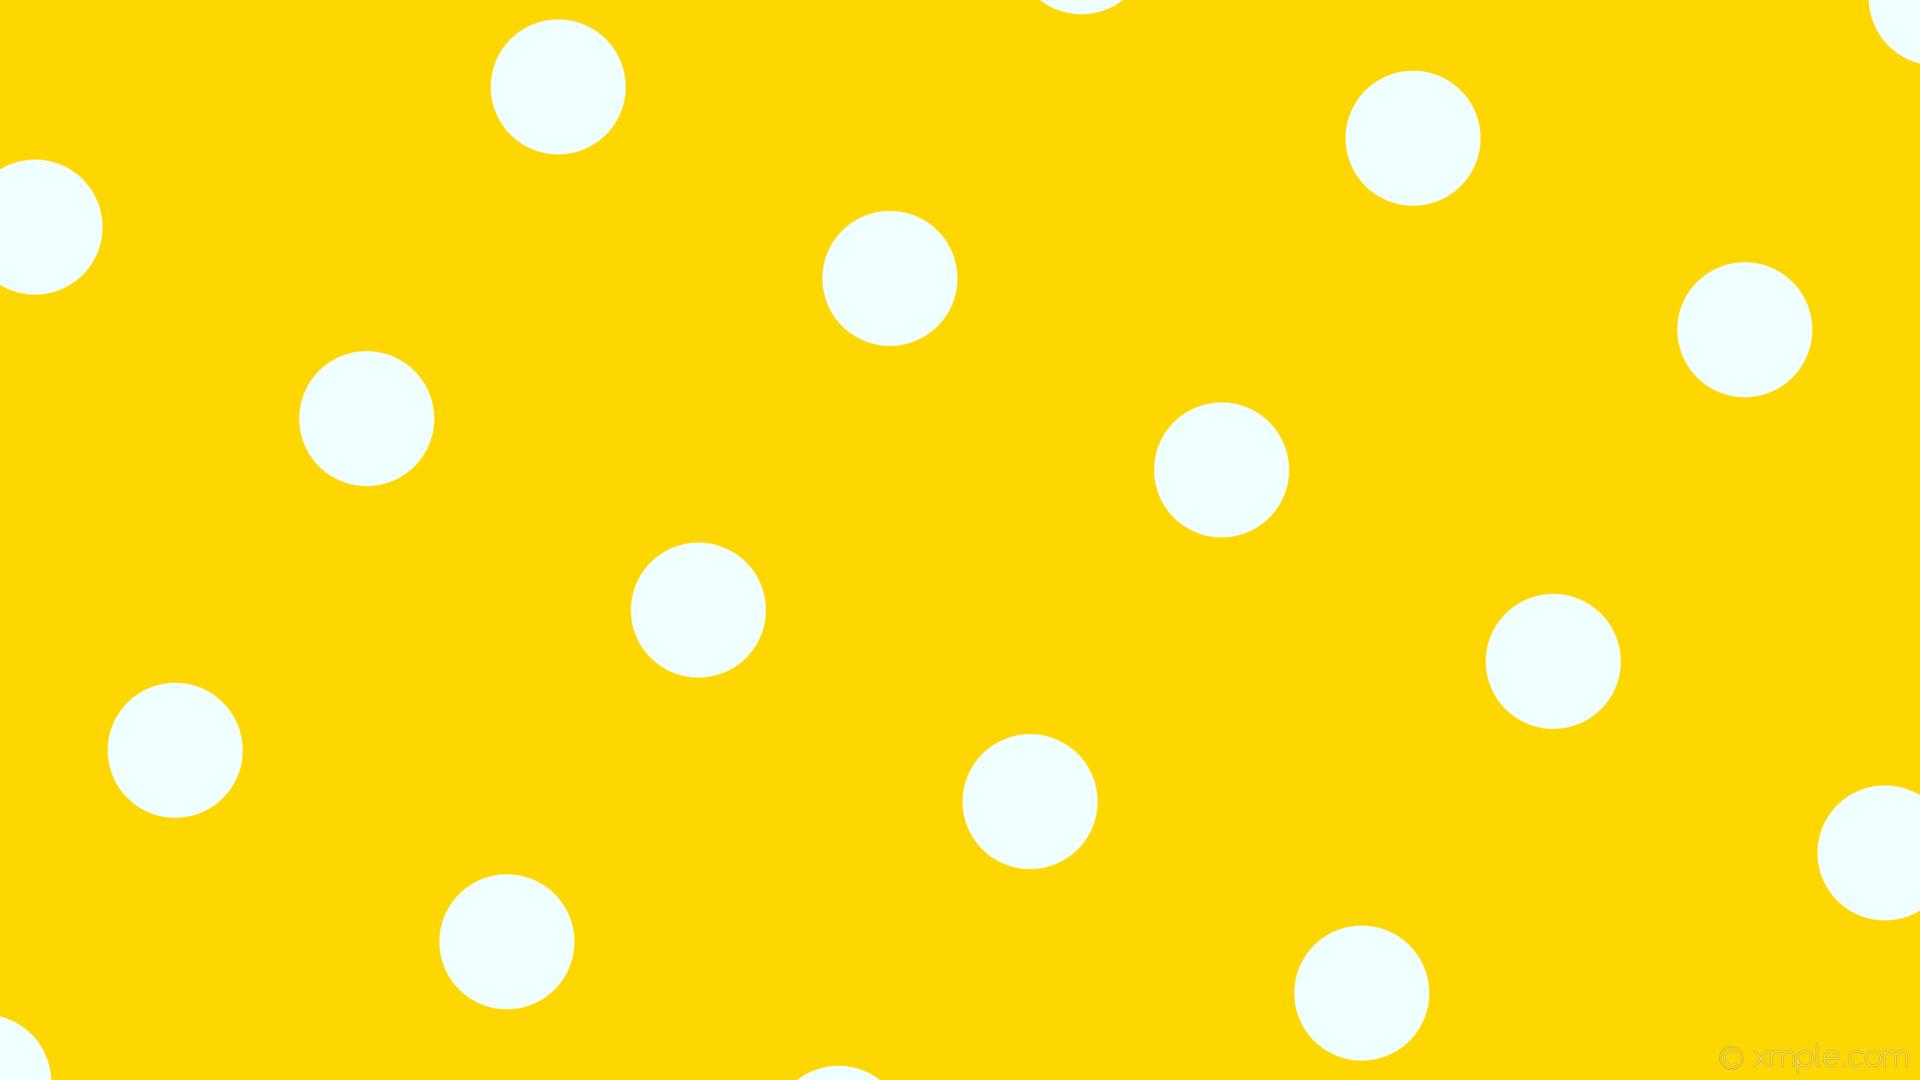 wallpaper polka dots spots yellow white gold azure #ffd700 #f0ffff 150°  135px 383px